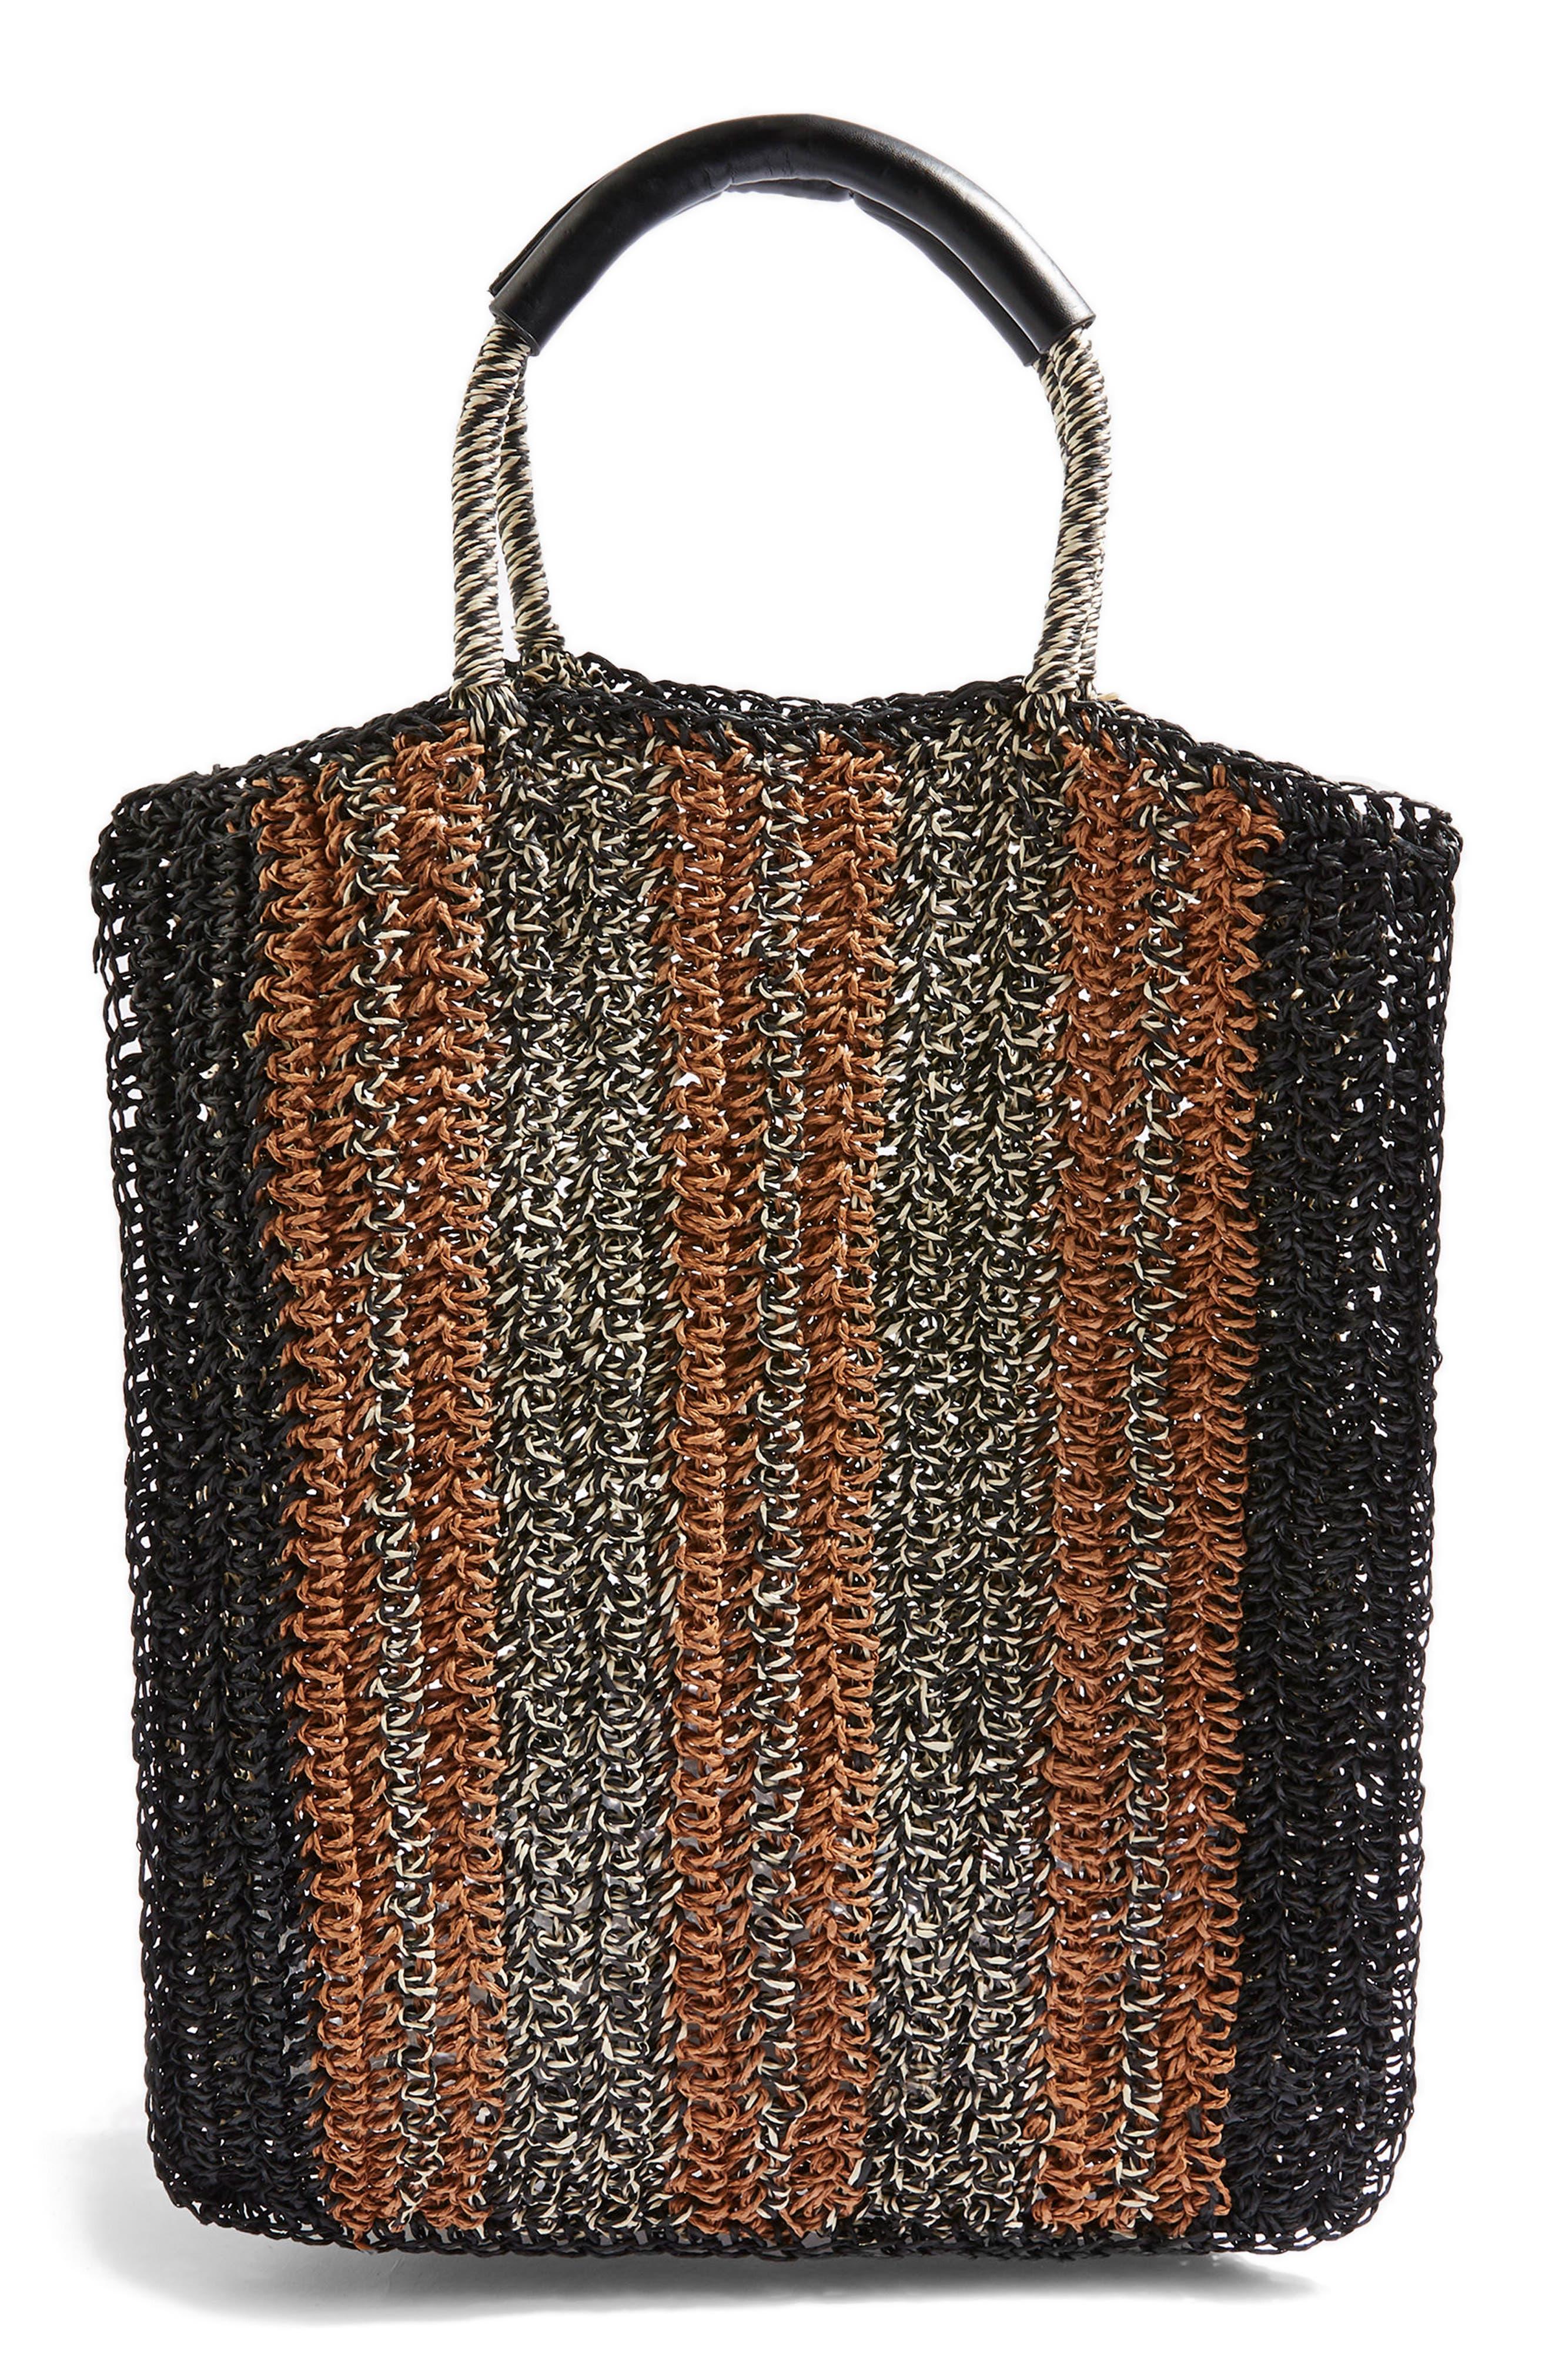 Bath Stripe Straw Tote Bag,                             Main thumbnail 1, color,                             Black Multi